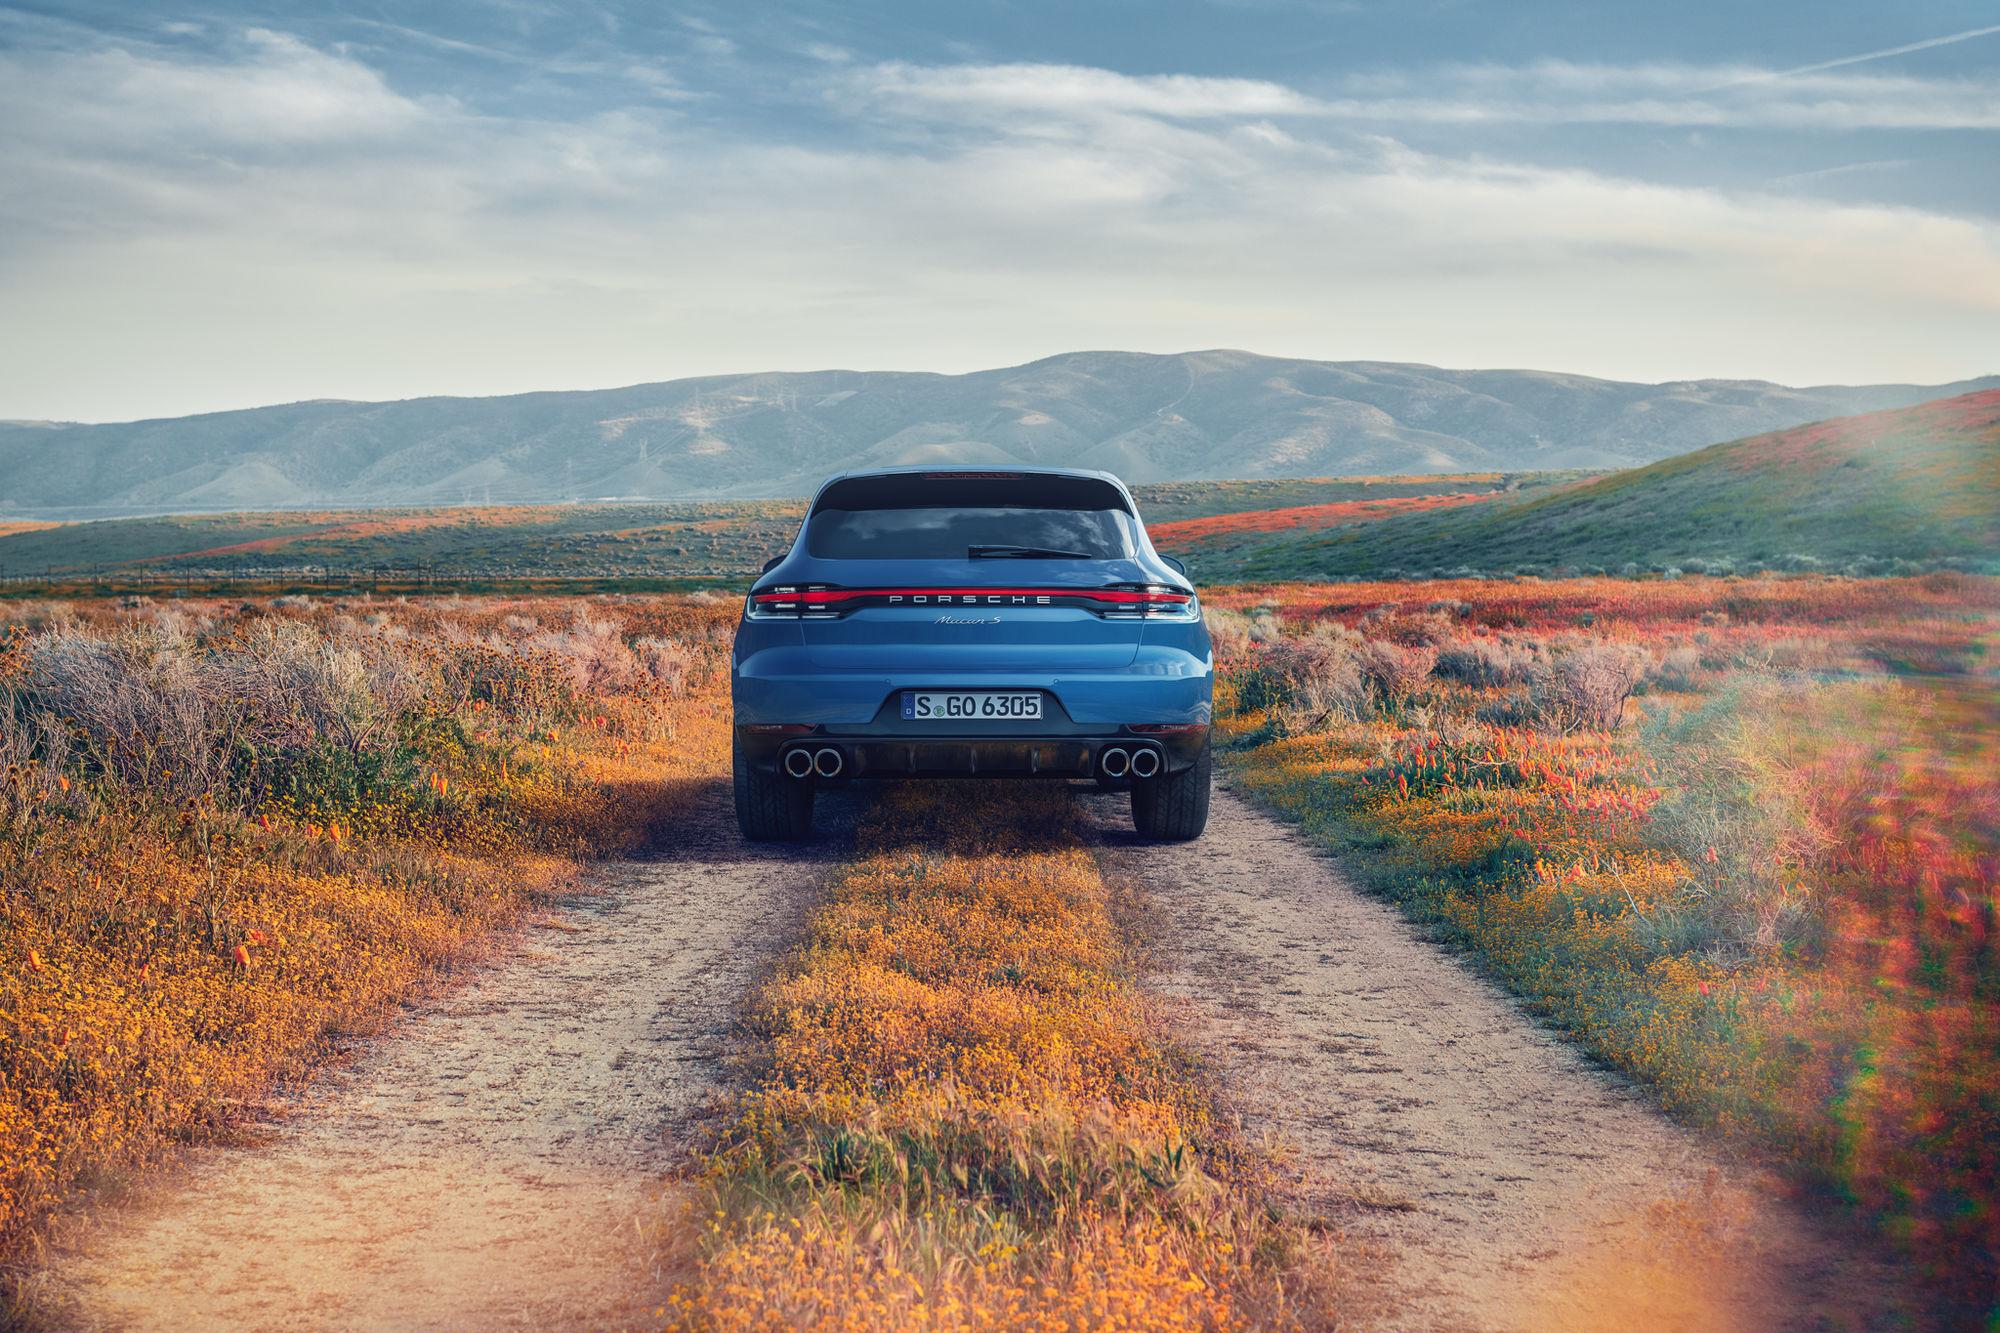 "SEVERIN WENDELER: TRANSPORTATION SPECIAL ""Porsche Macan"" Photo & CGI Project by Lisa Linke c/o Severin Wendeler collaboration with Curve Digital"